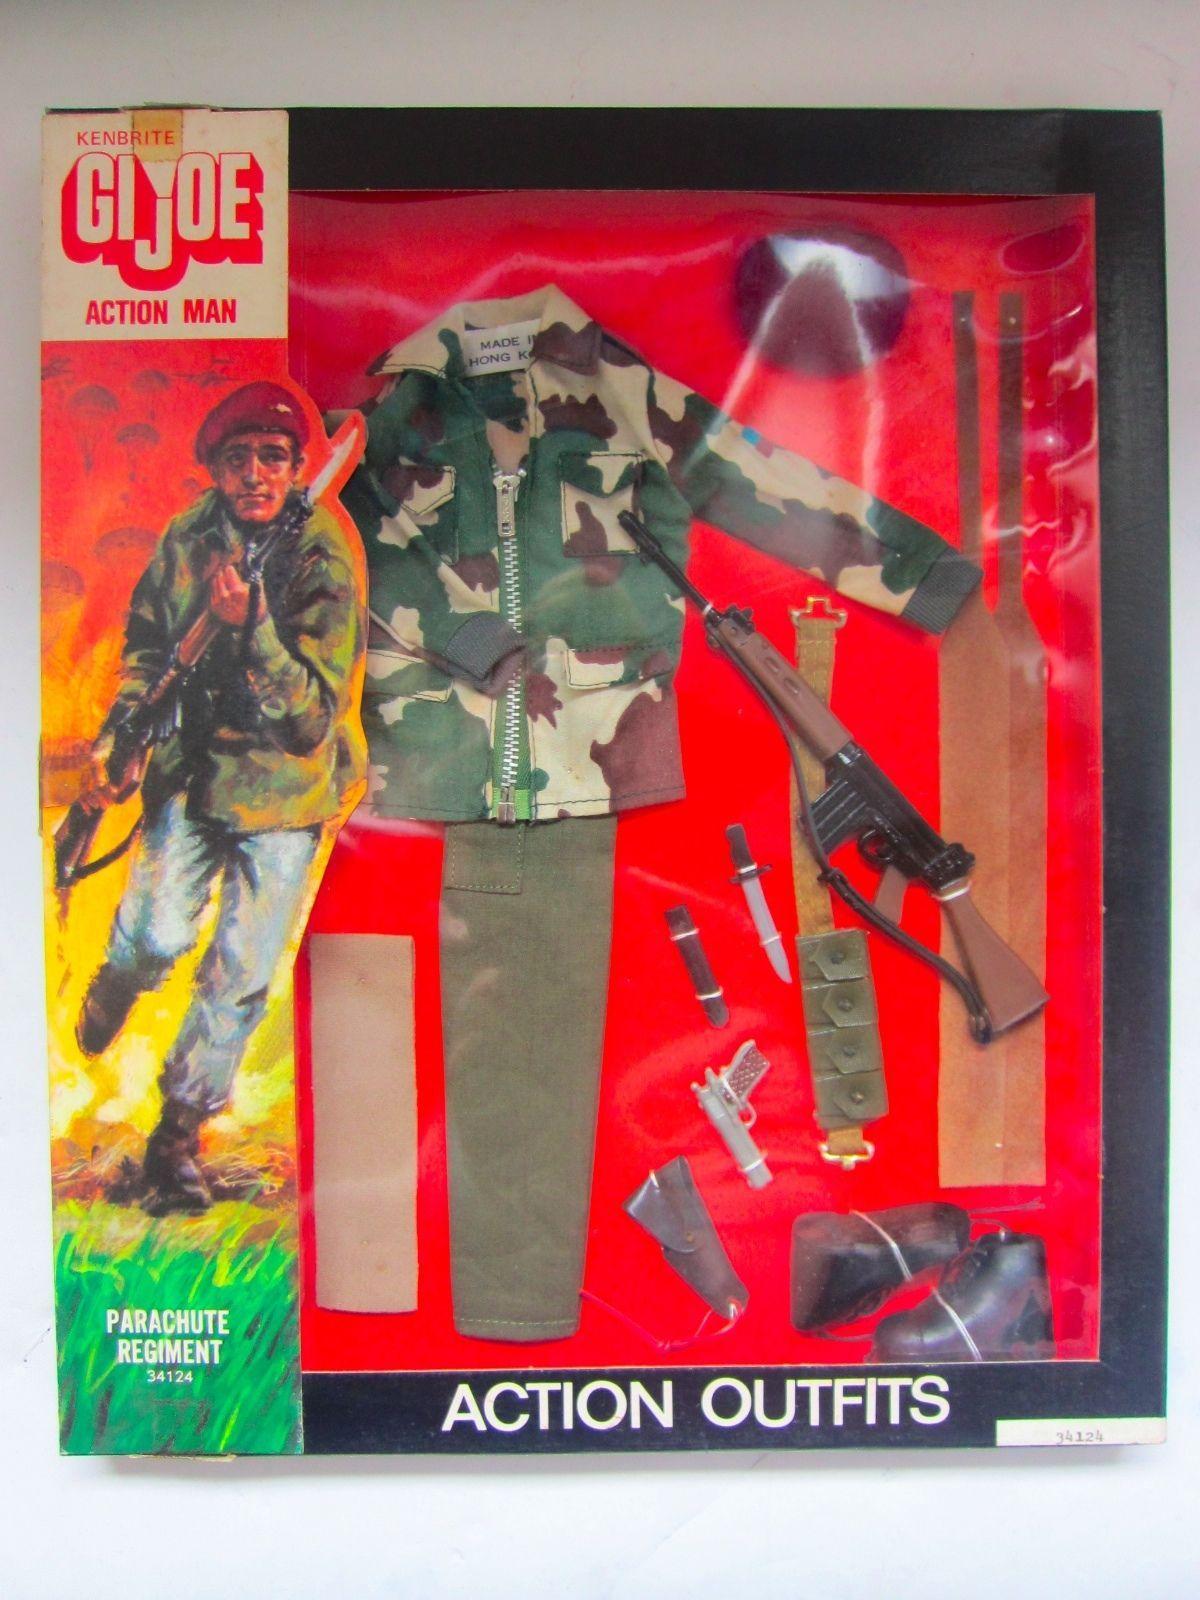 Vintage Australian Kenbrite G I Joe Action Man Parachute Regiment Outfit Boxed Sealed 1975 Gi Joe Toy Parachutes Vintage Toys 1970s